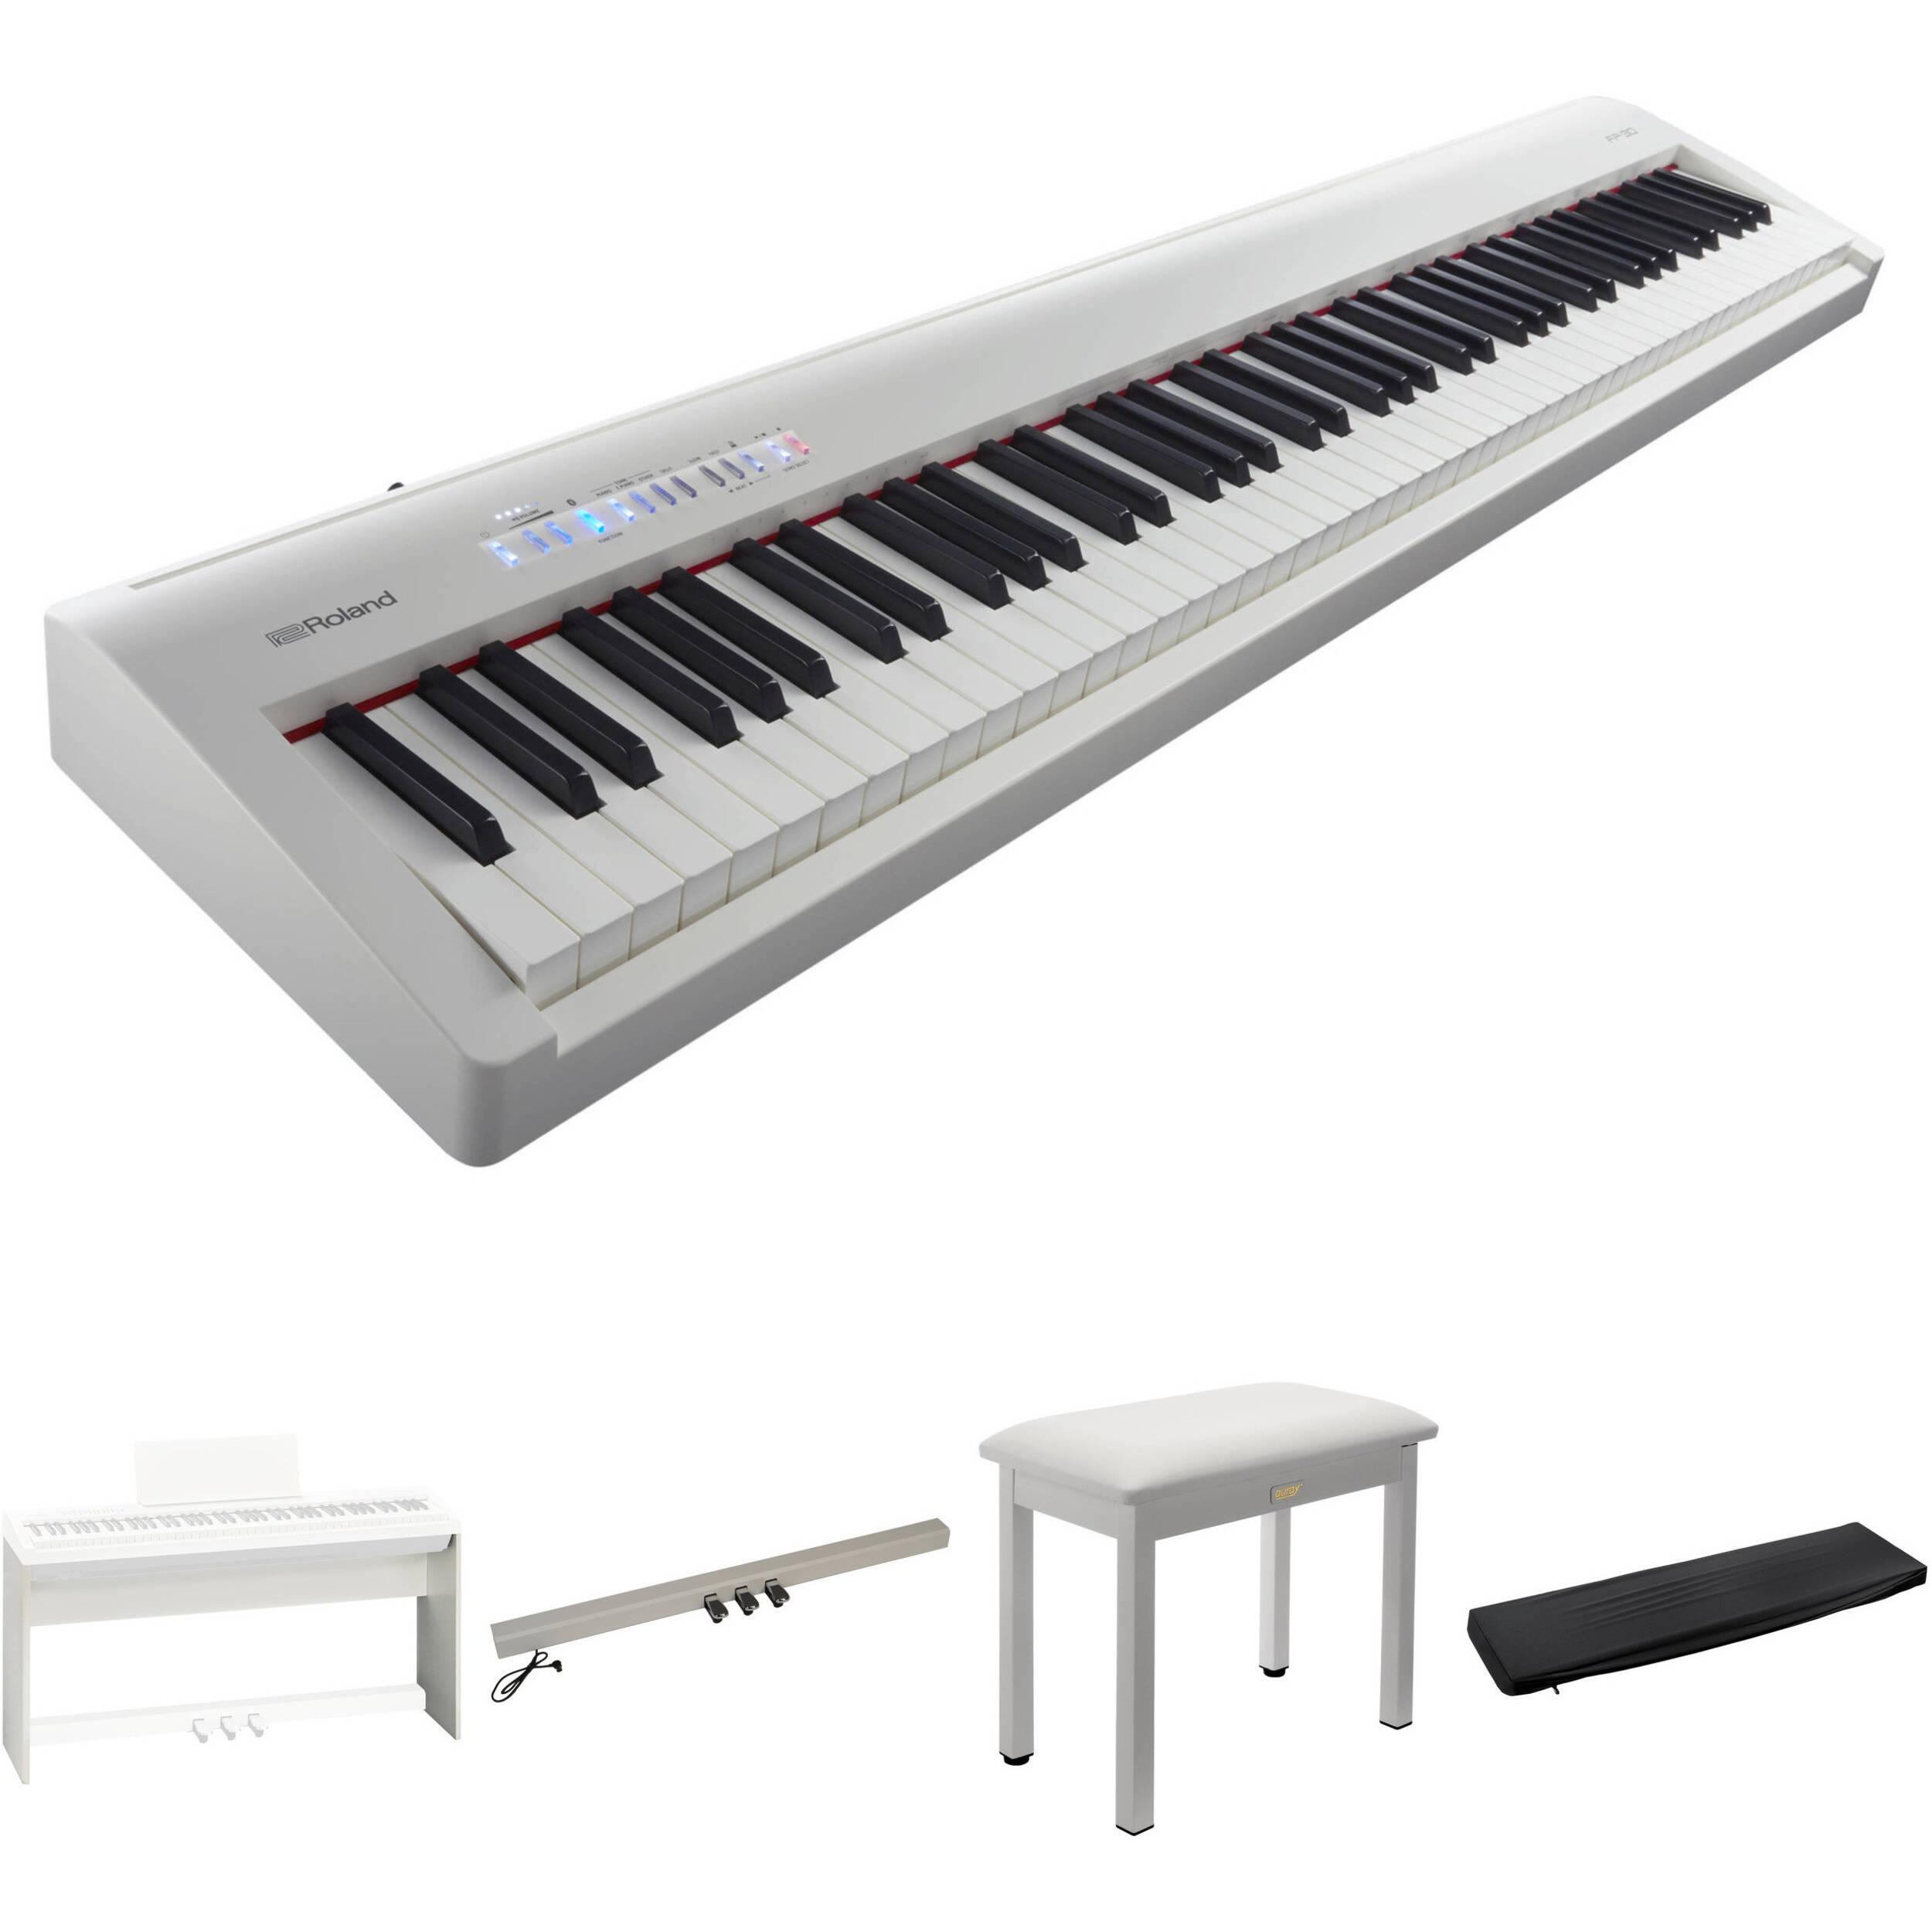 Roland Fp 30 88 Key Supernatural Digital Piano : roland fp 30 digital piano kit with stand pedal unit bench ~ Hamham.info Haus und Dekorationen